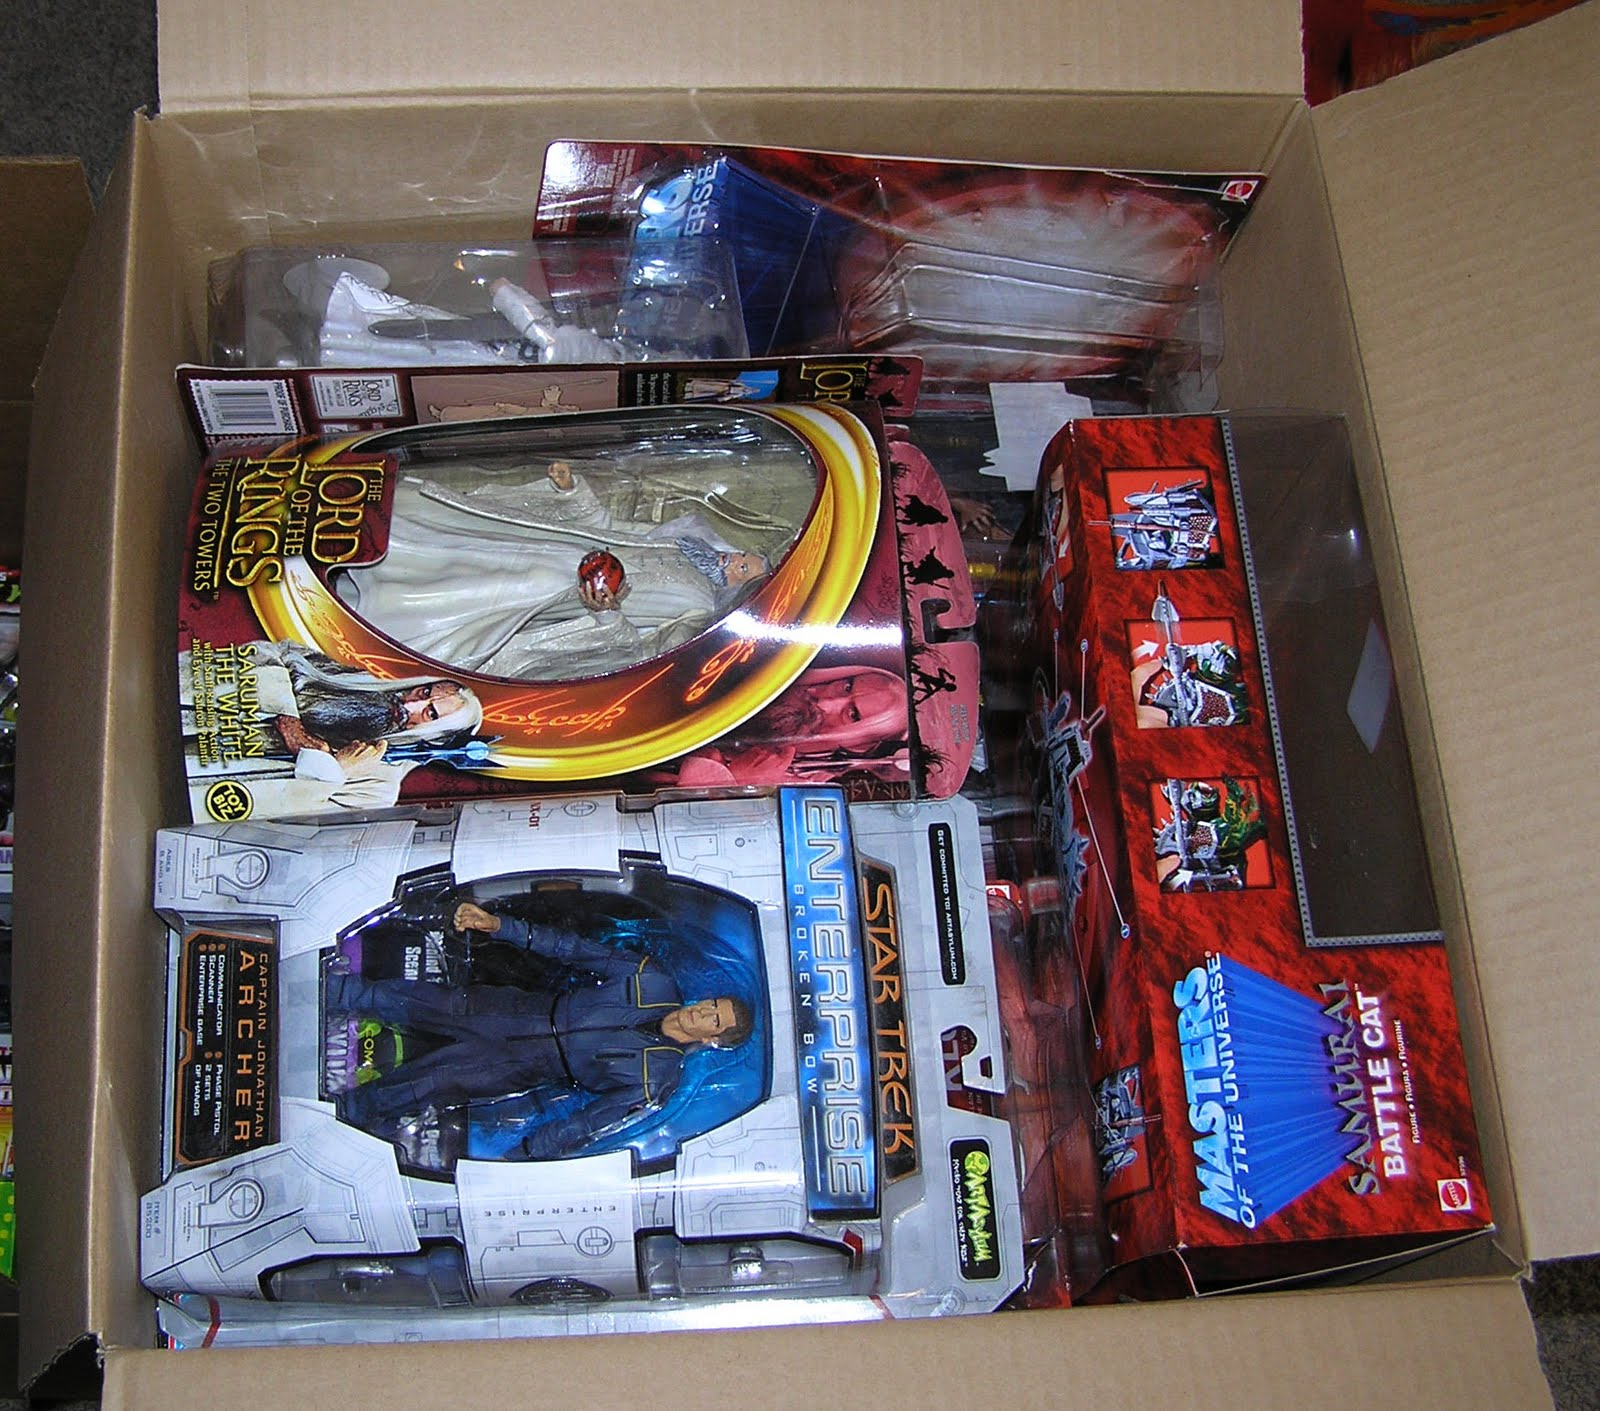 http://2.bp.blogspot.com/-By6X_8EeYKs/TWQZE06wpfI/AAAAAAAADpM/hwlaJJSgiiI/s1600/He-Man%2BBox.jpg